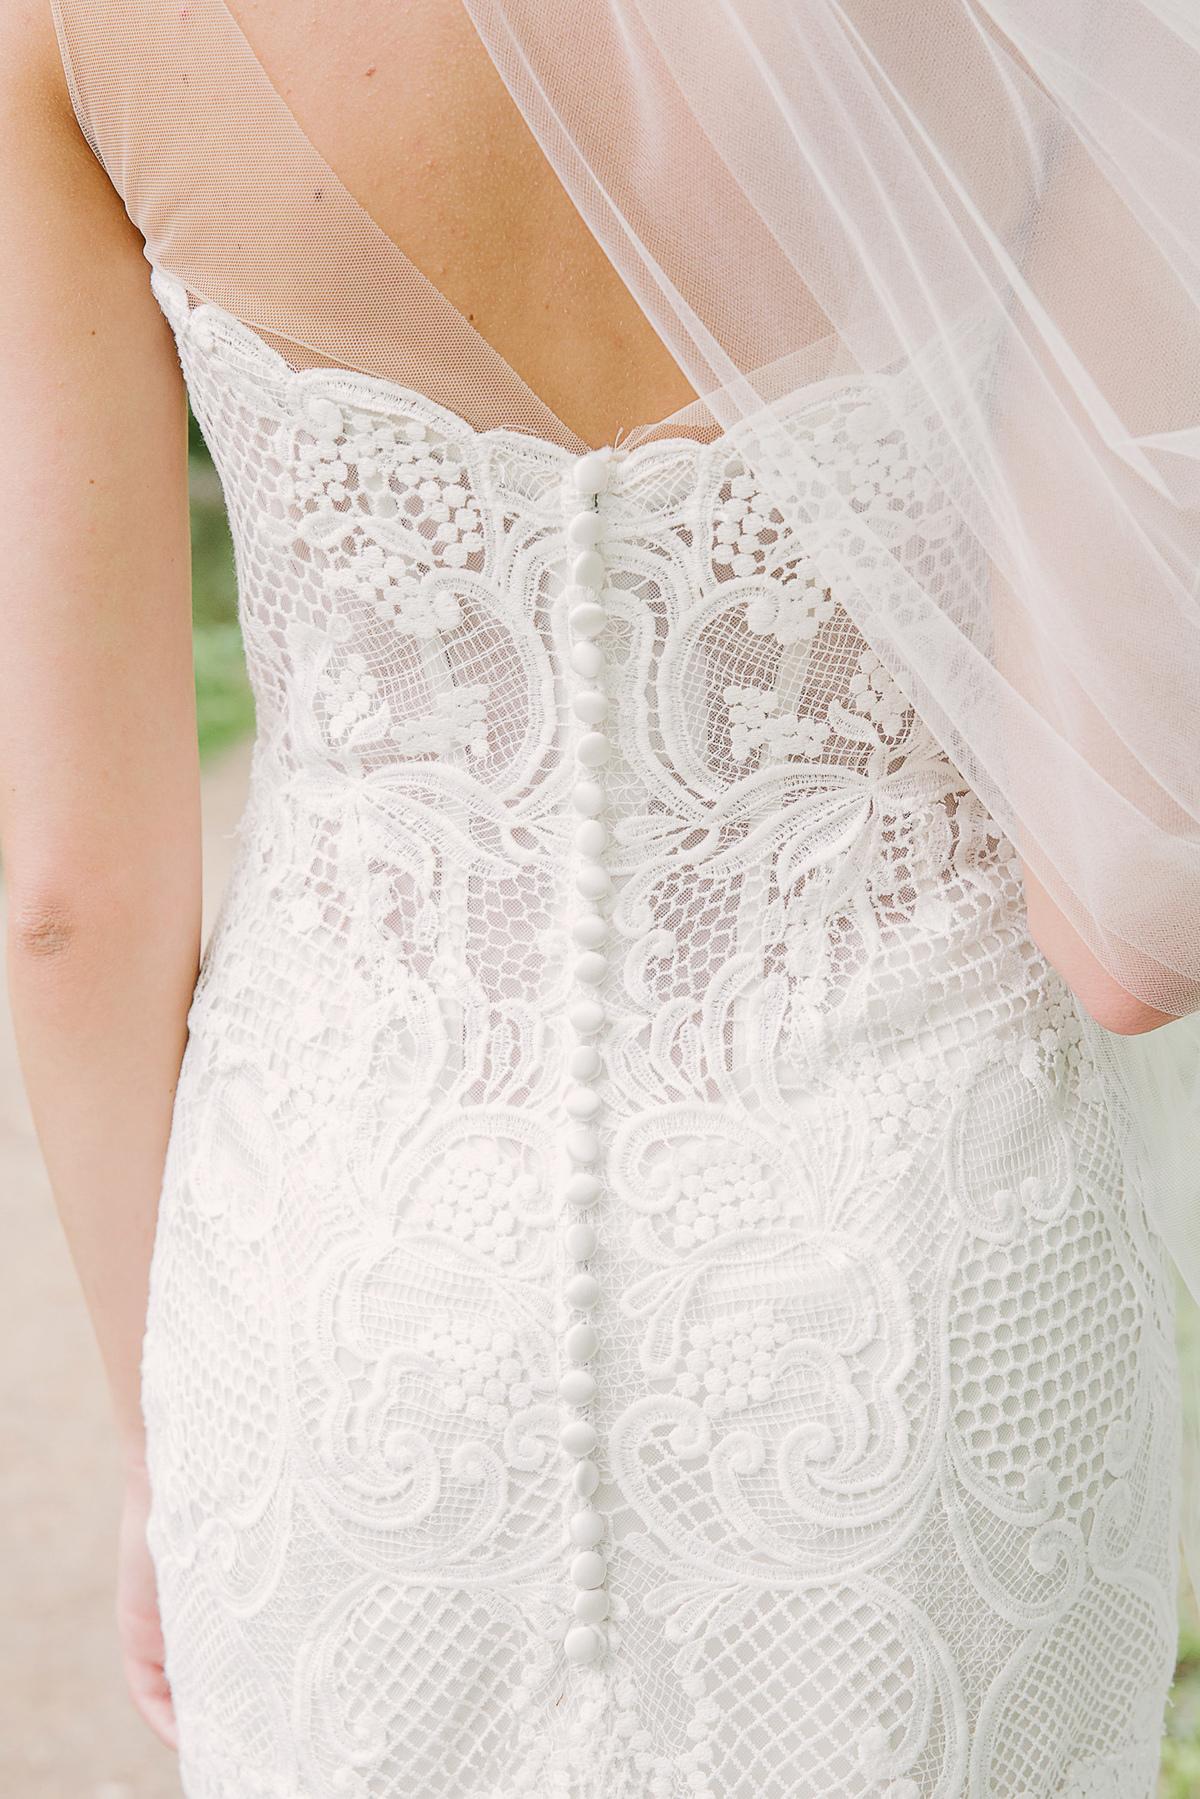 Lace-Wedding-Dress-Back-Chicago-Wedding-Glamour-Lace-Events.jpg